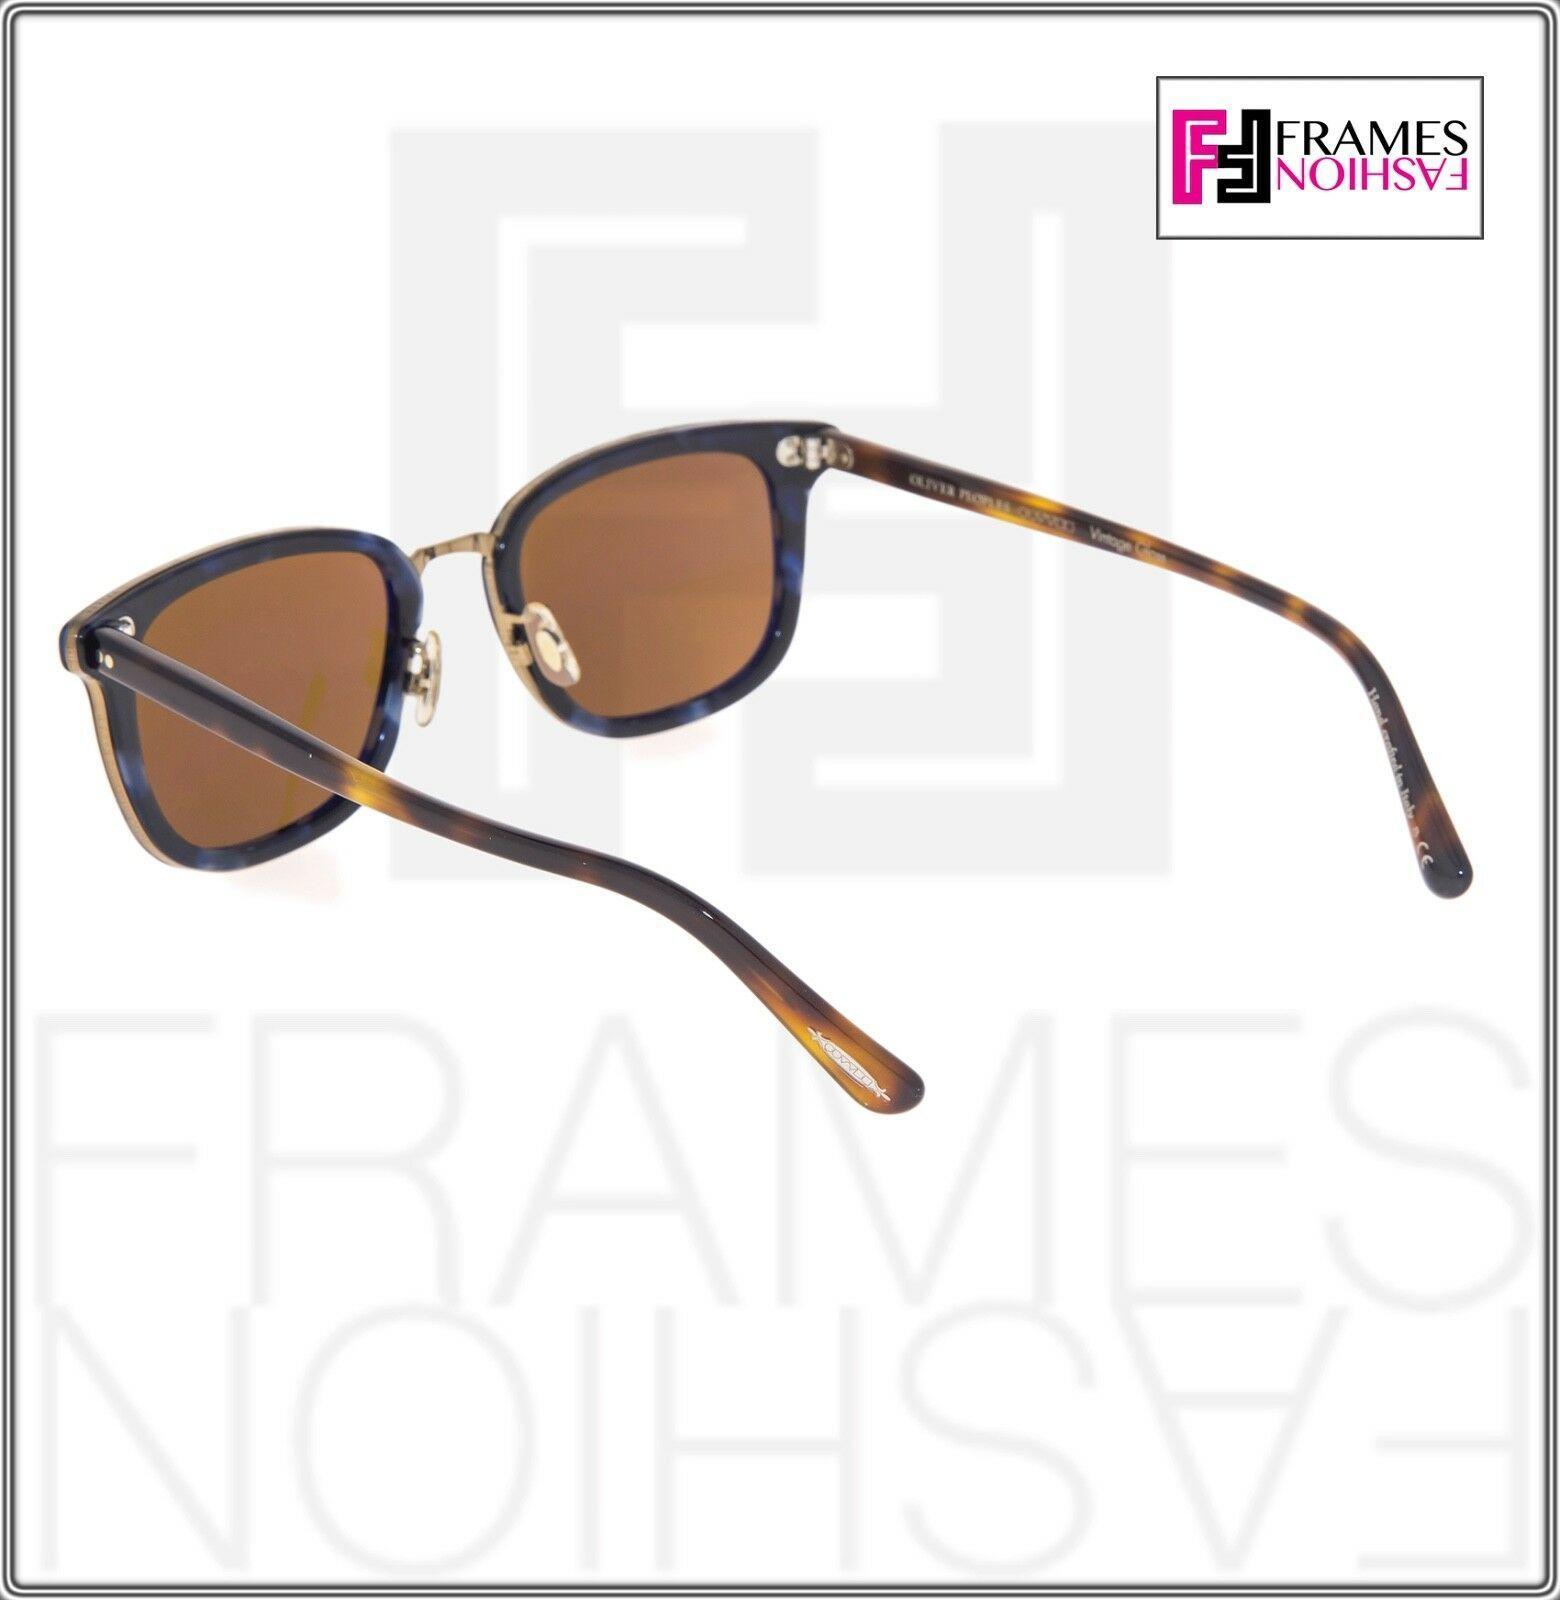 OLIVER PEOPLES KETTNER OV5339S Brown Blue Tortoise Cosmik Sunglasses 5339 image 3